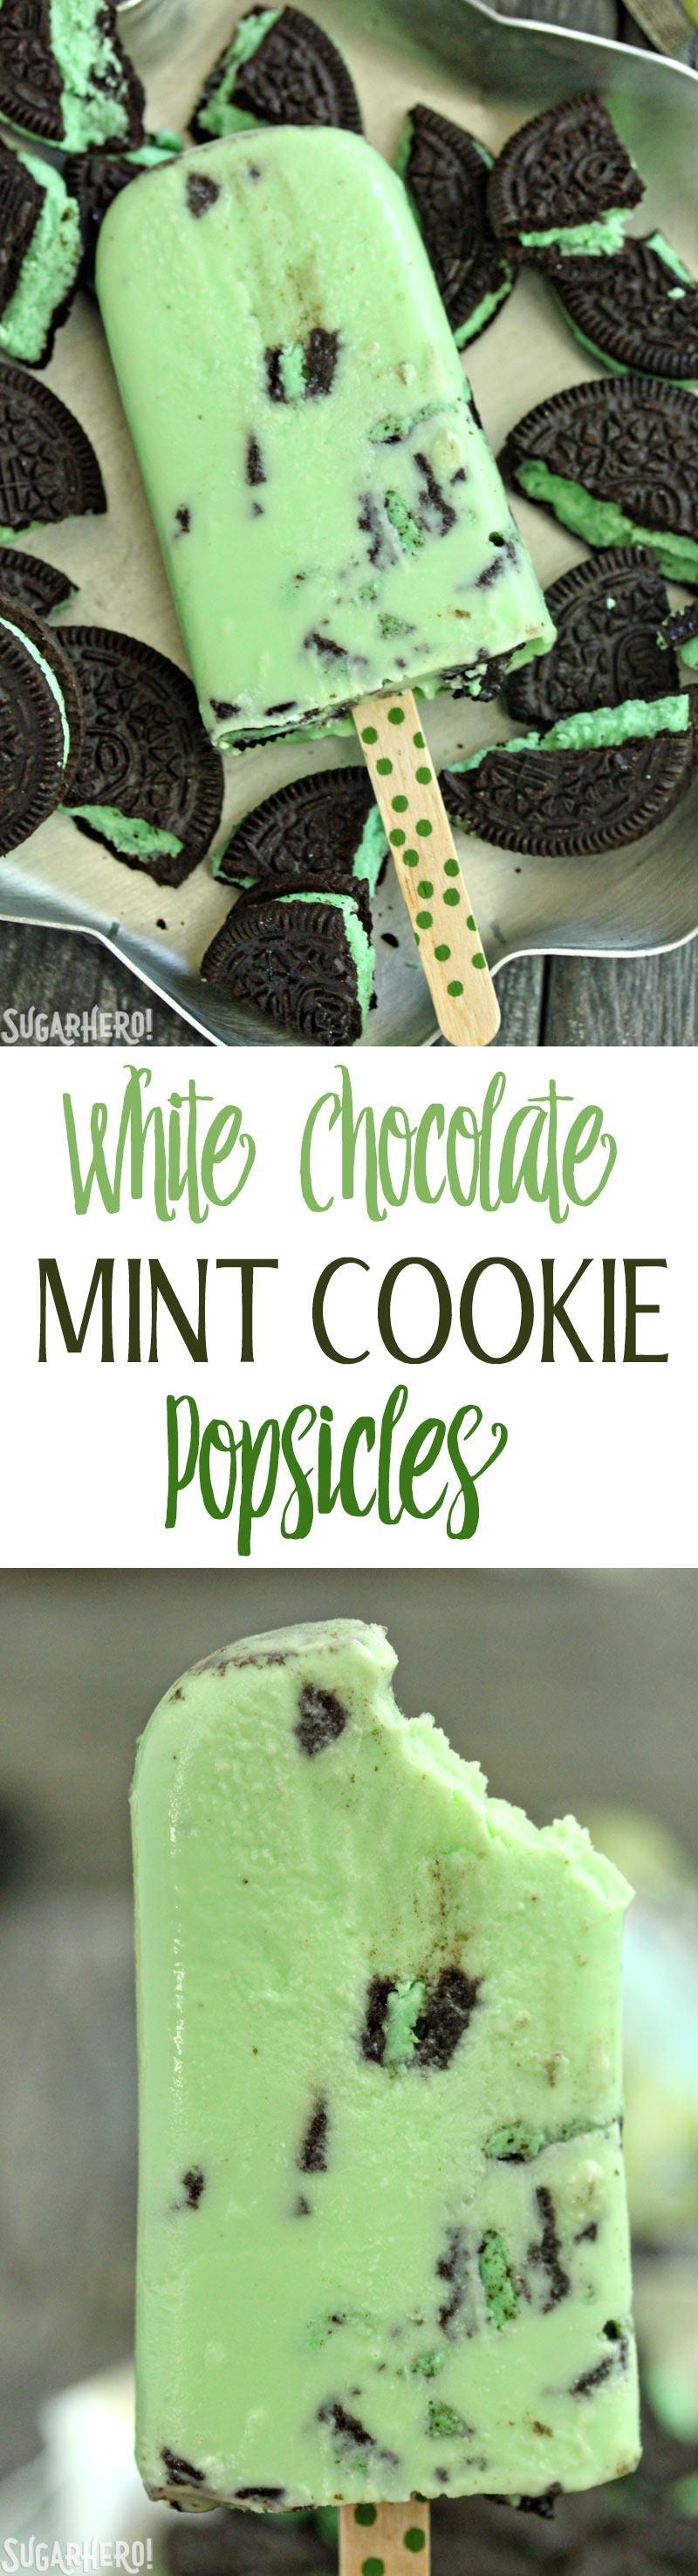 White Chocolate Mint Cookie Popsicles - SugarHero